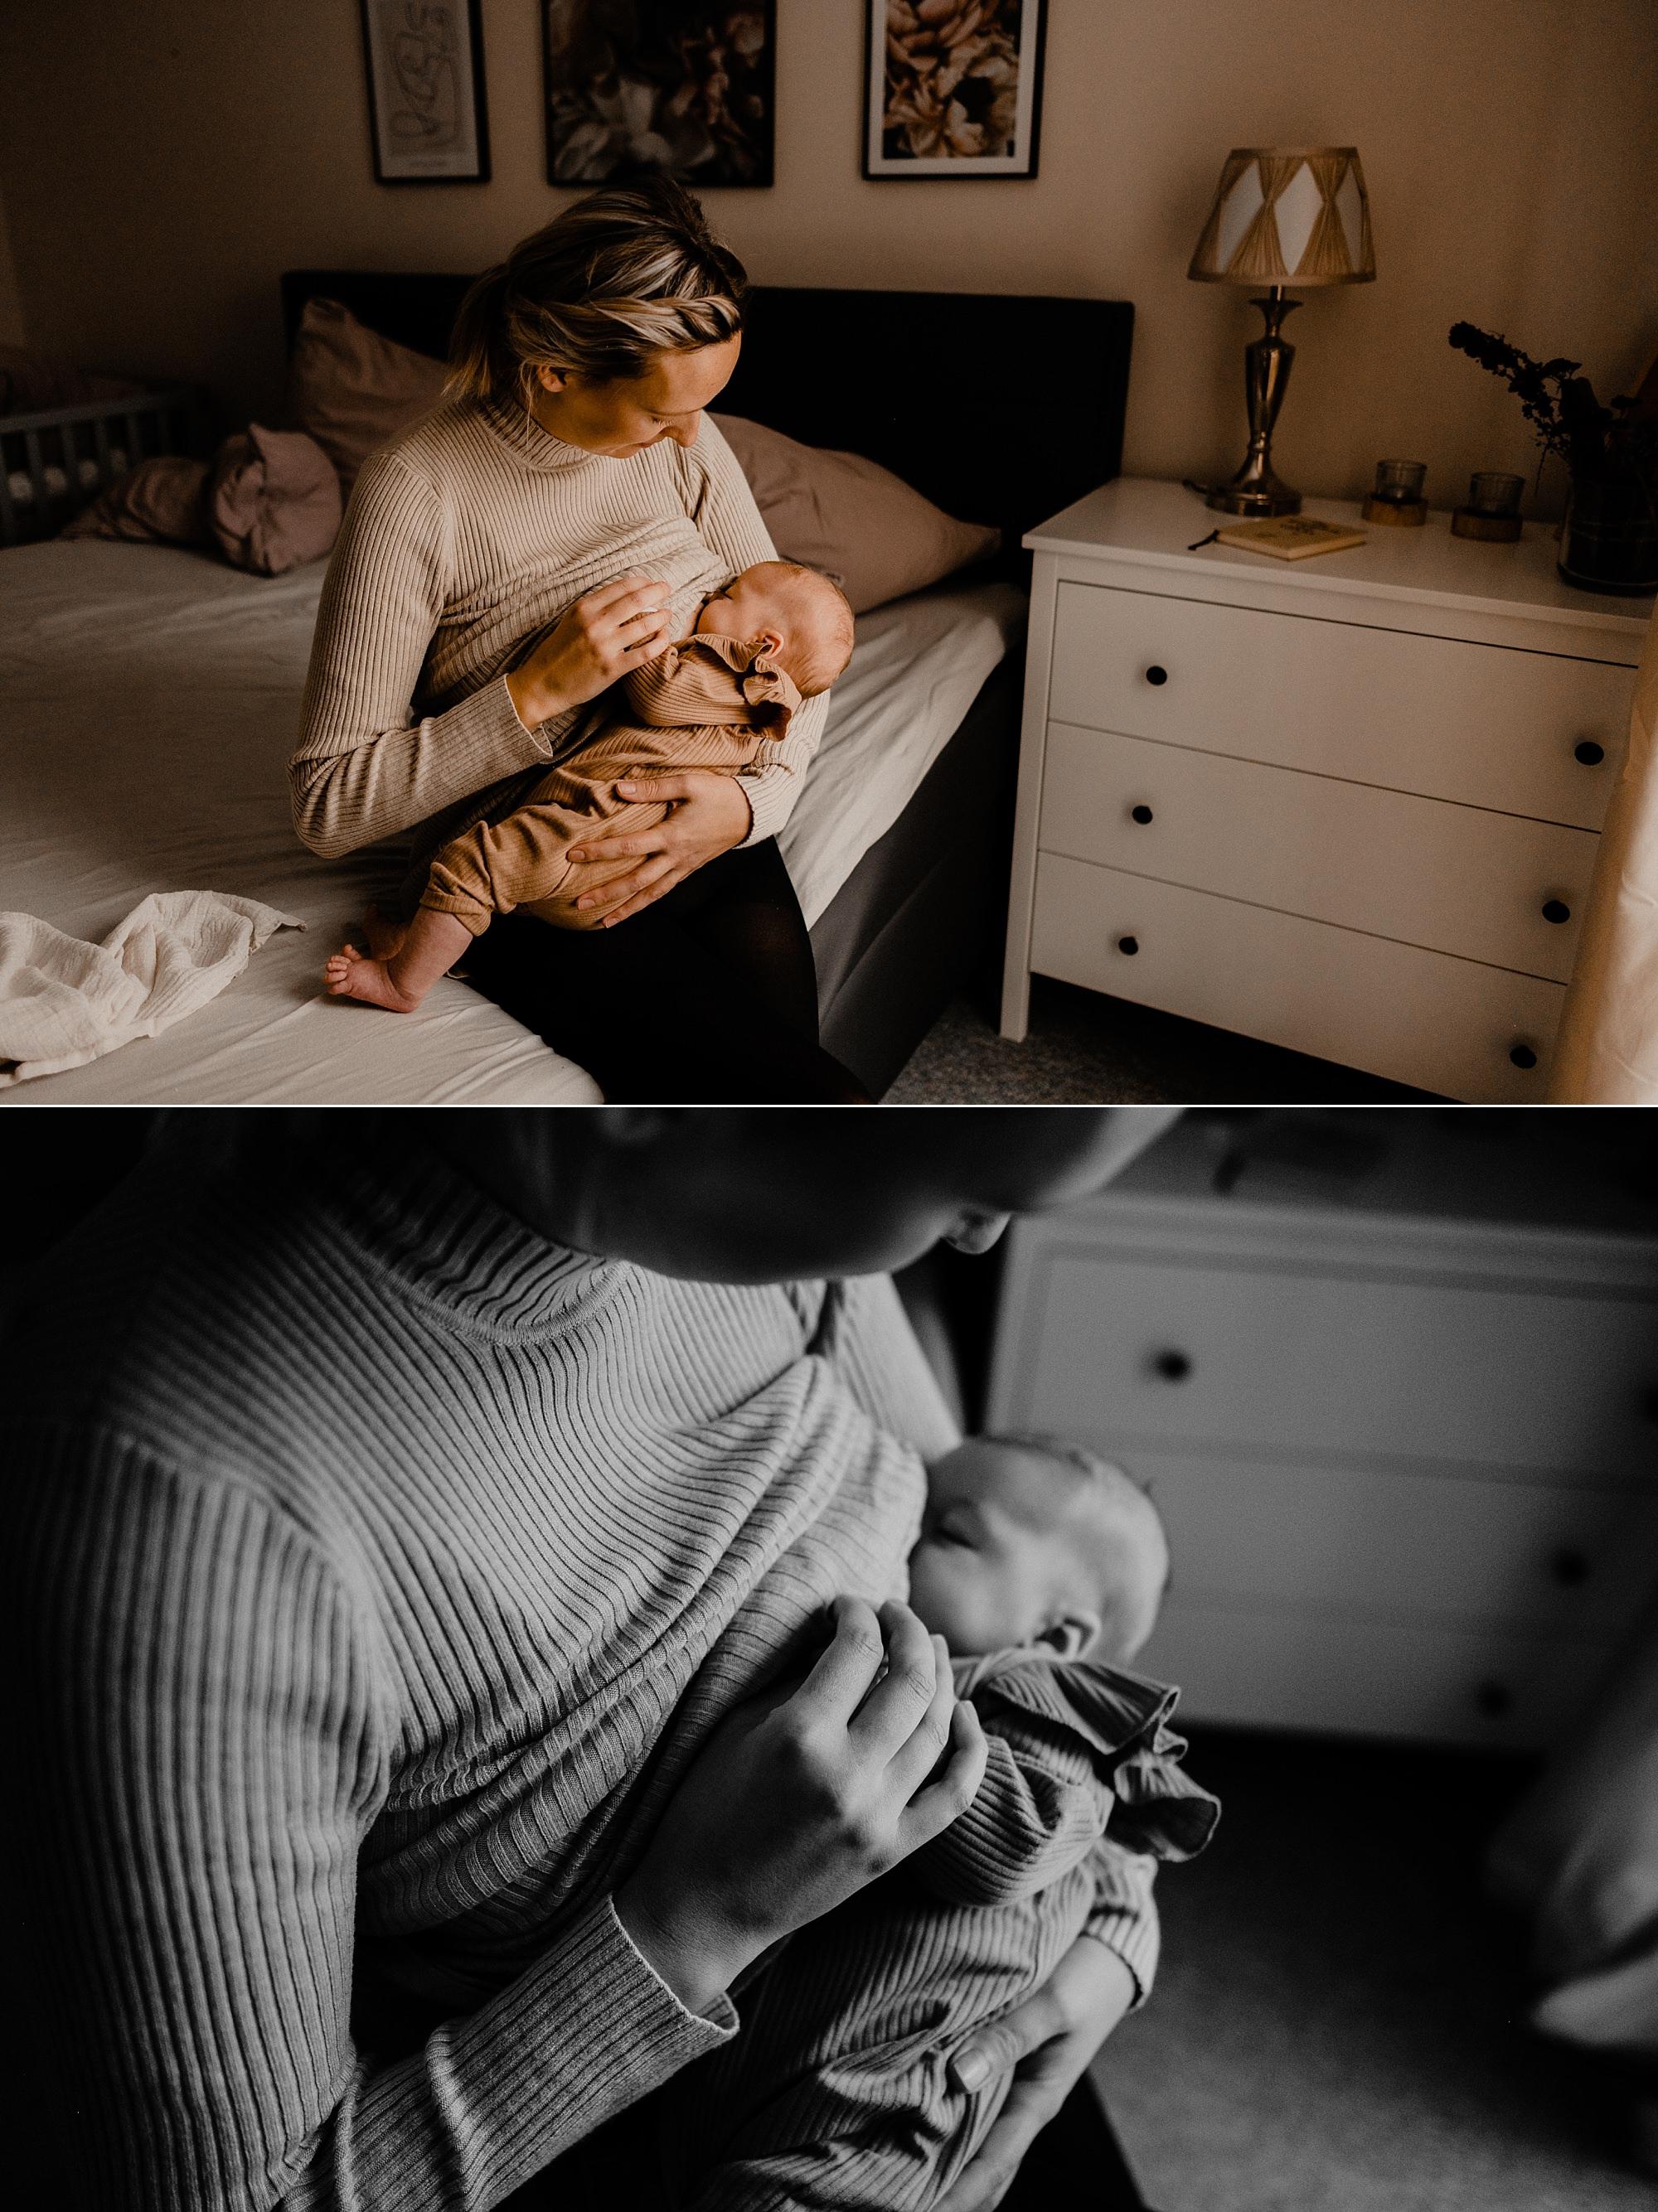 Familienshooting - Ueckermünde - Babyfotograf - Torgelow - Fotograf - Eggesin - Familienfotos - Neubrandenburg - Neugeborenenshooting - Pasewalk - Fotograf - Usedom